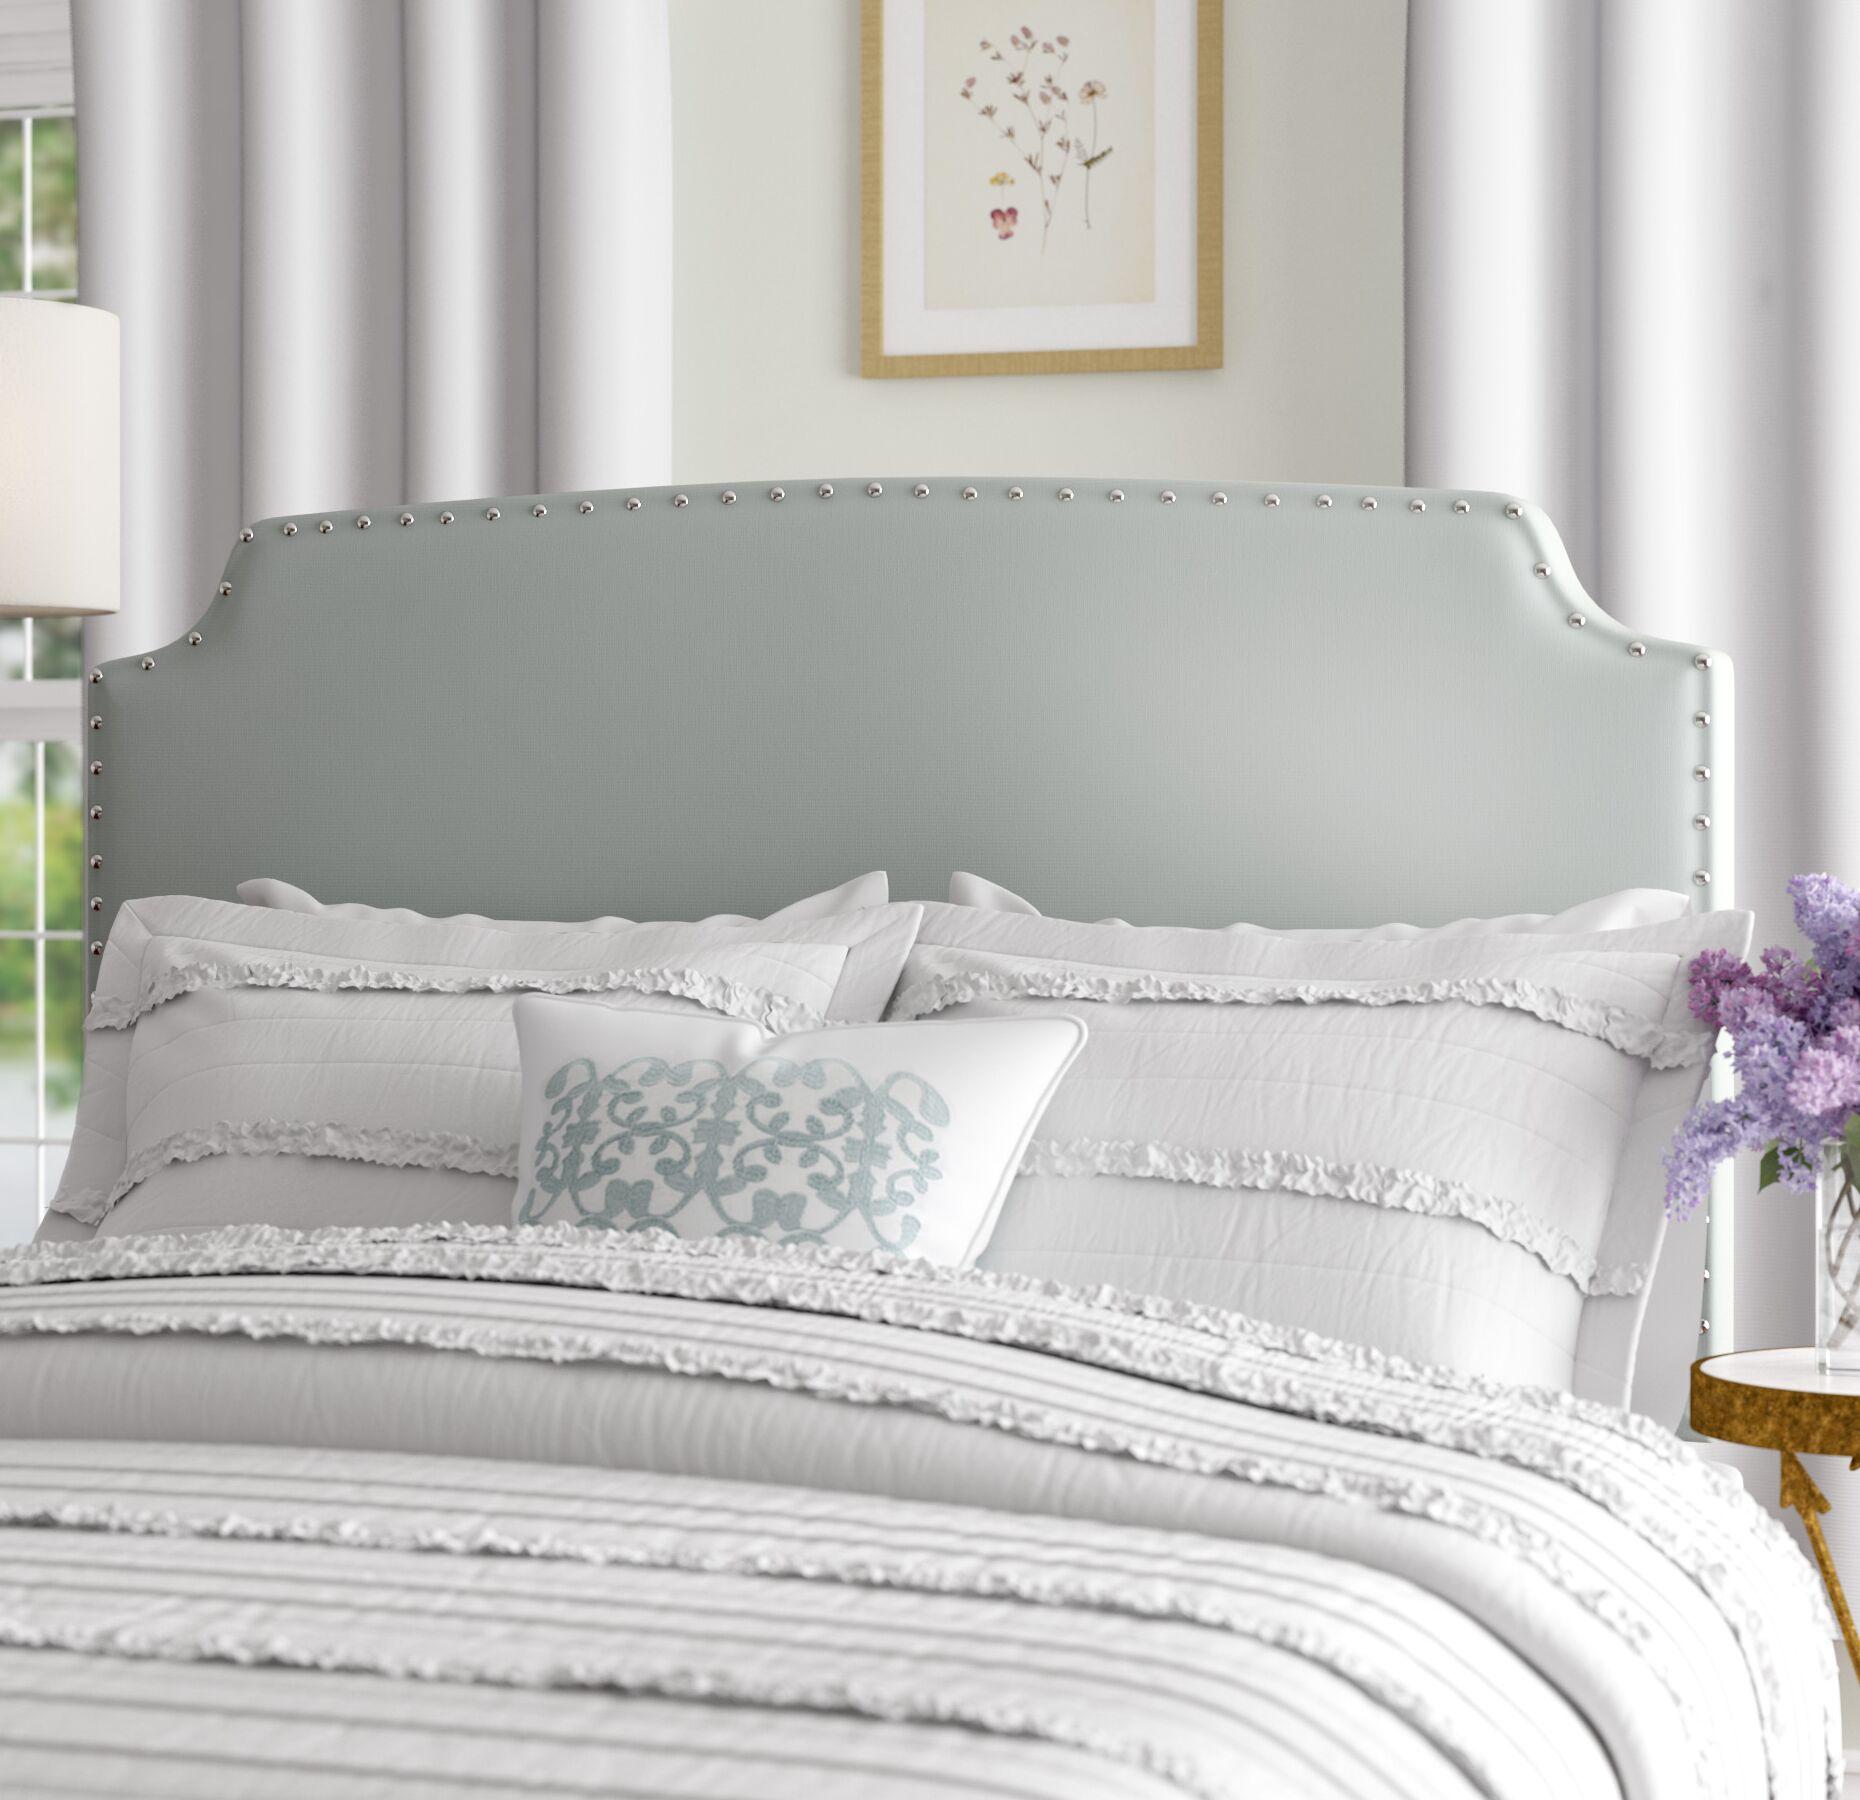 Almeida Upholstered Panel Headboard Size: Queen/Full, Upholstery: Dusty Aqua